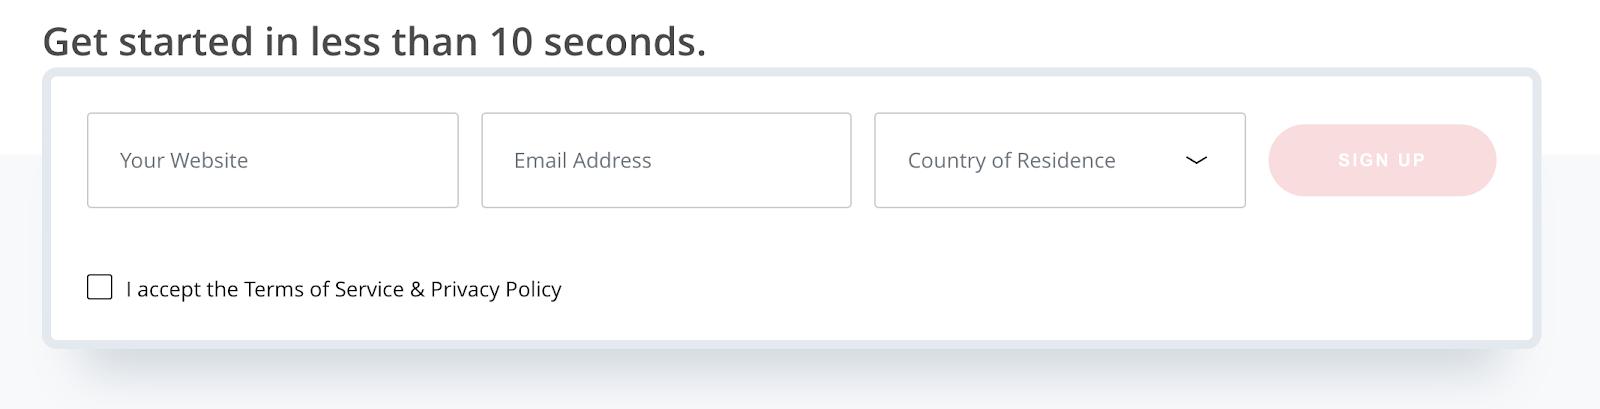 Media.net Sign up Process (Screenshot)